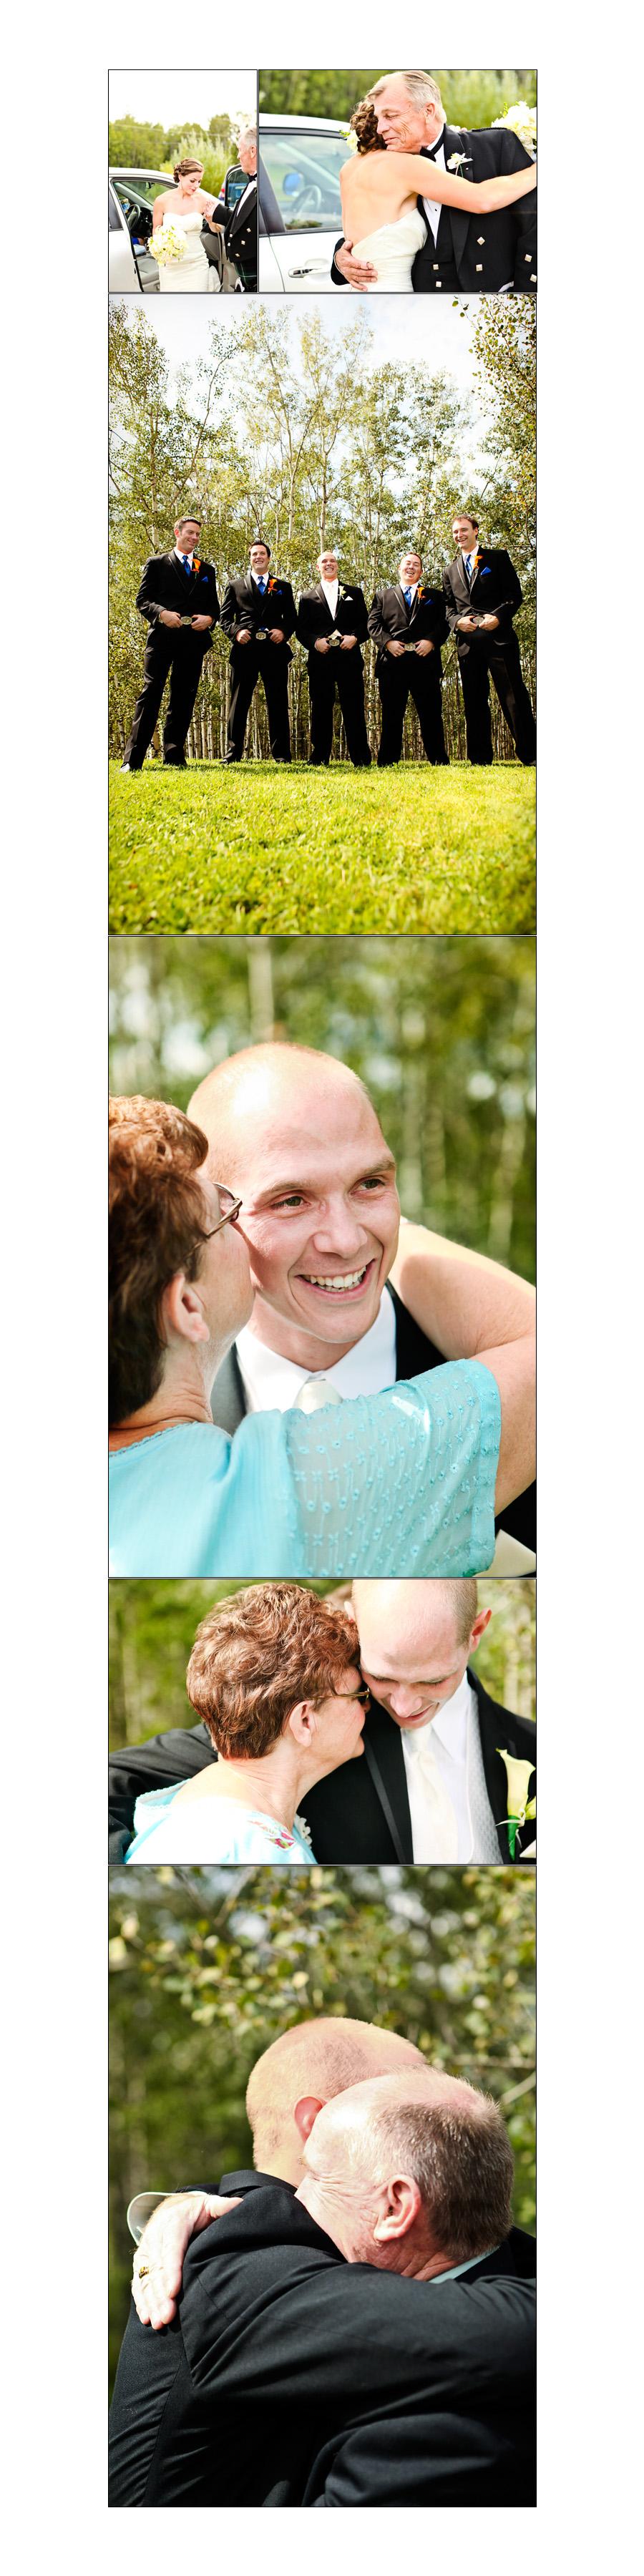 blog3-wedding